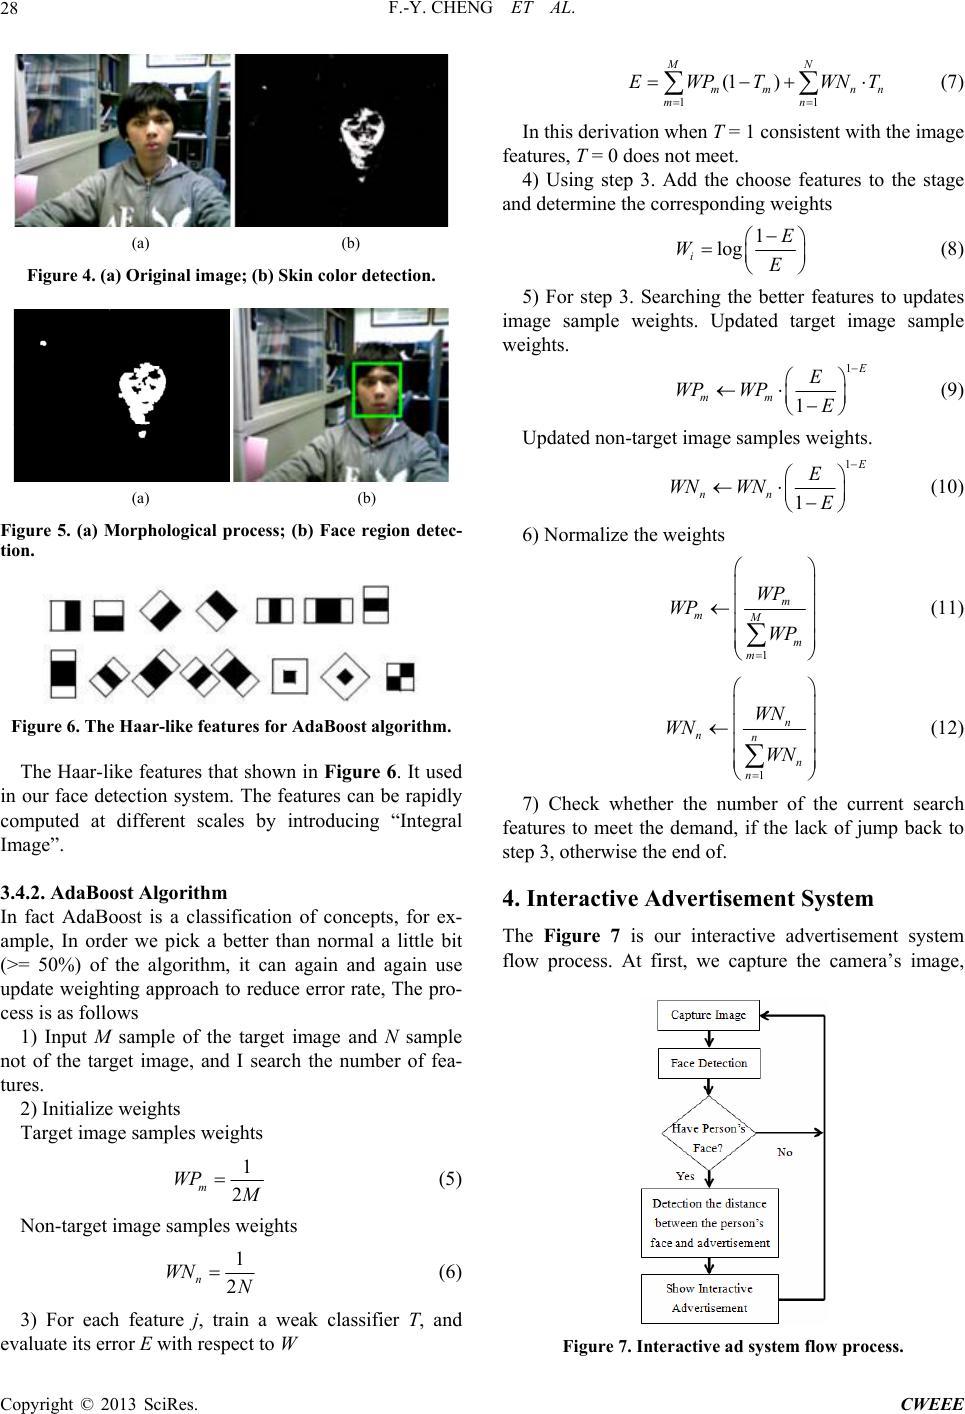 Digital Interactive Kanban Advertisement System Using Face